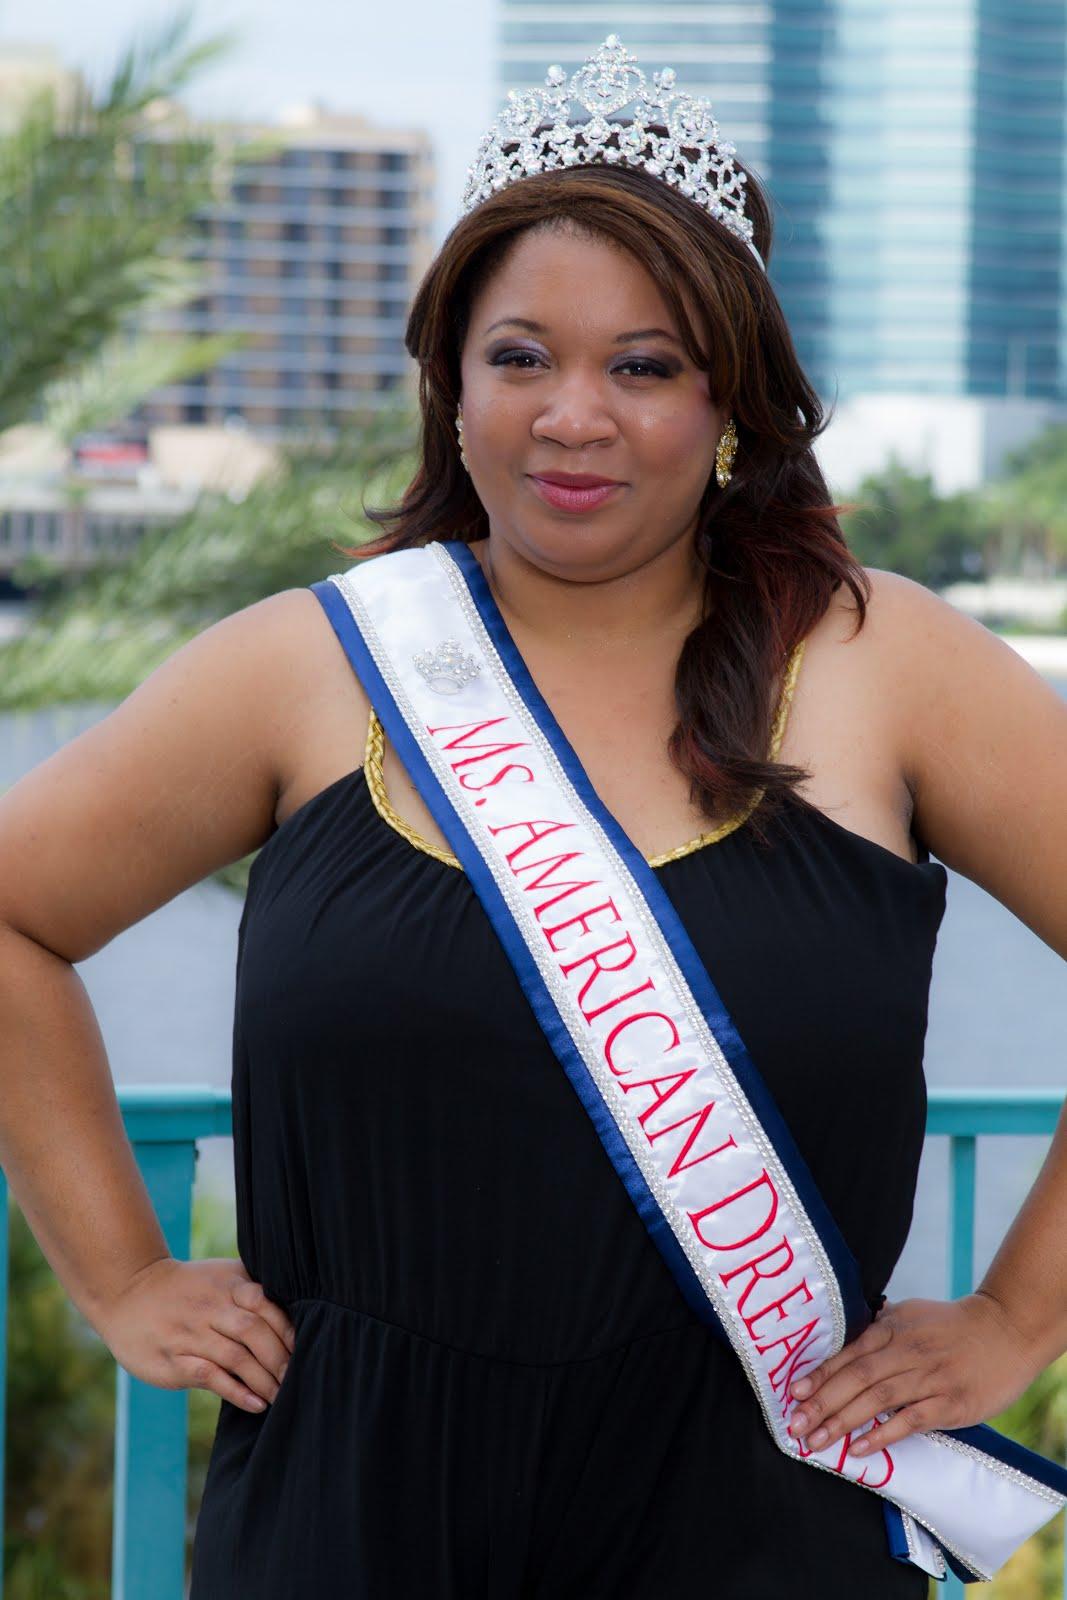 Ms. American Dream 2015